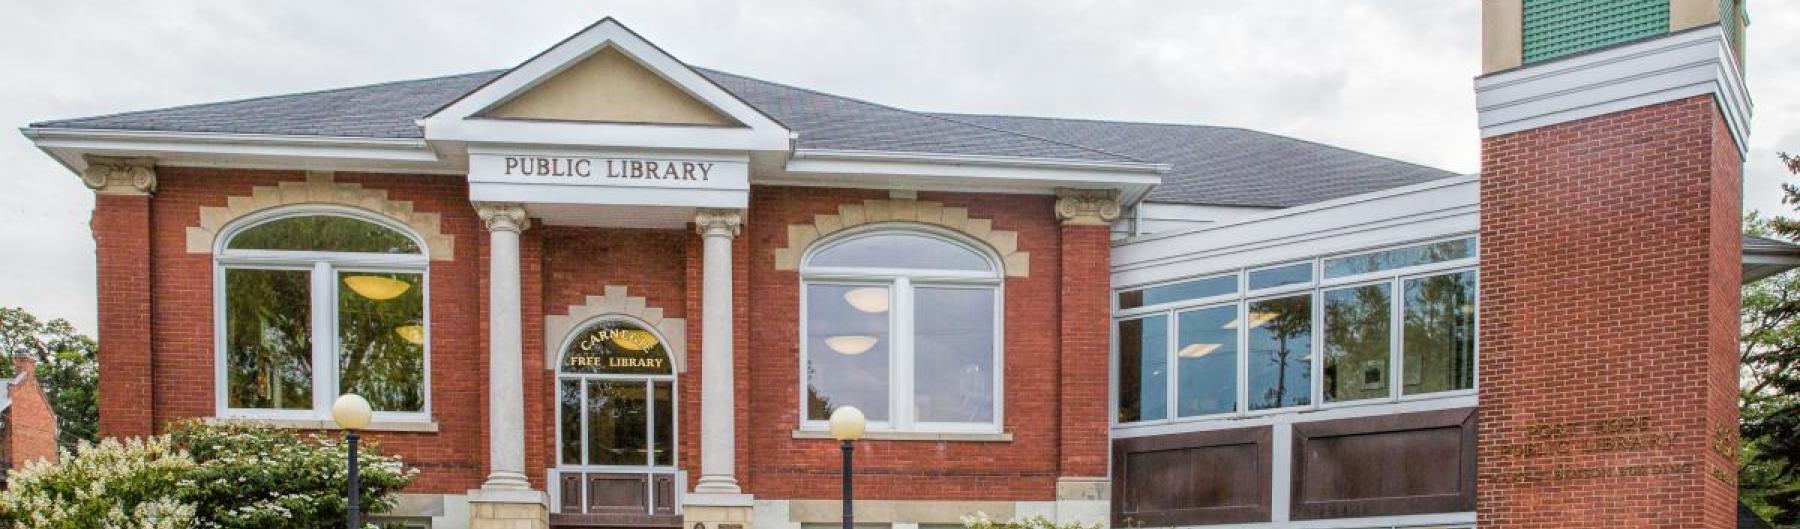 Port Hope Public Library - Port Hope Branch